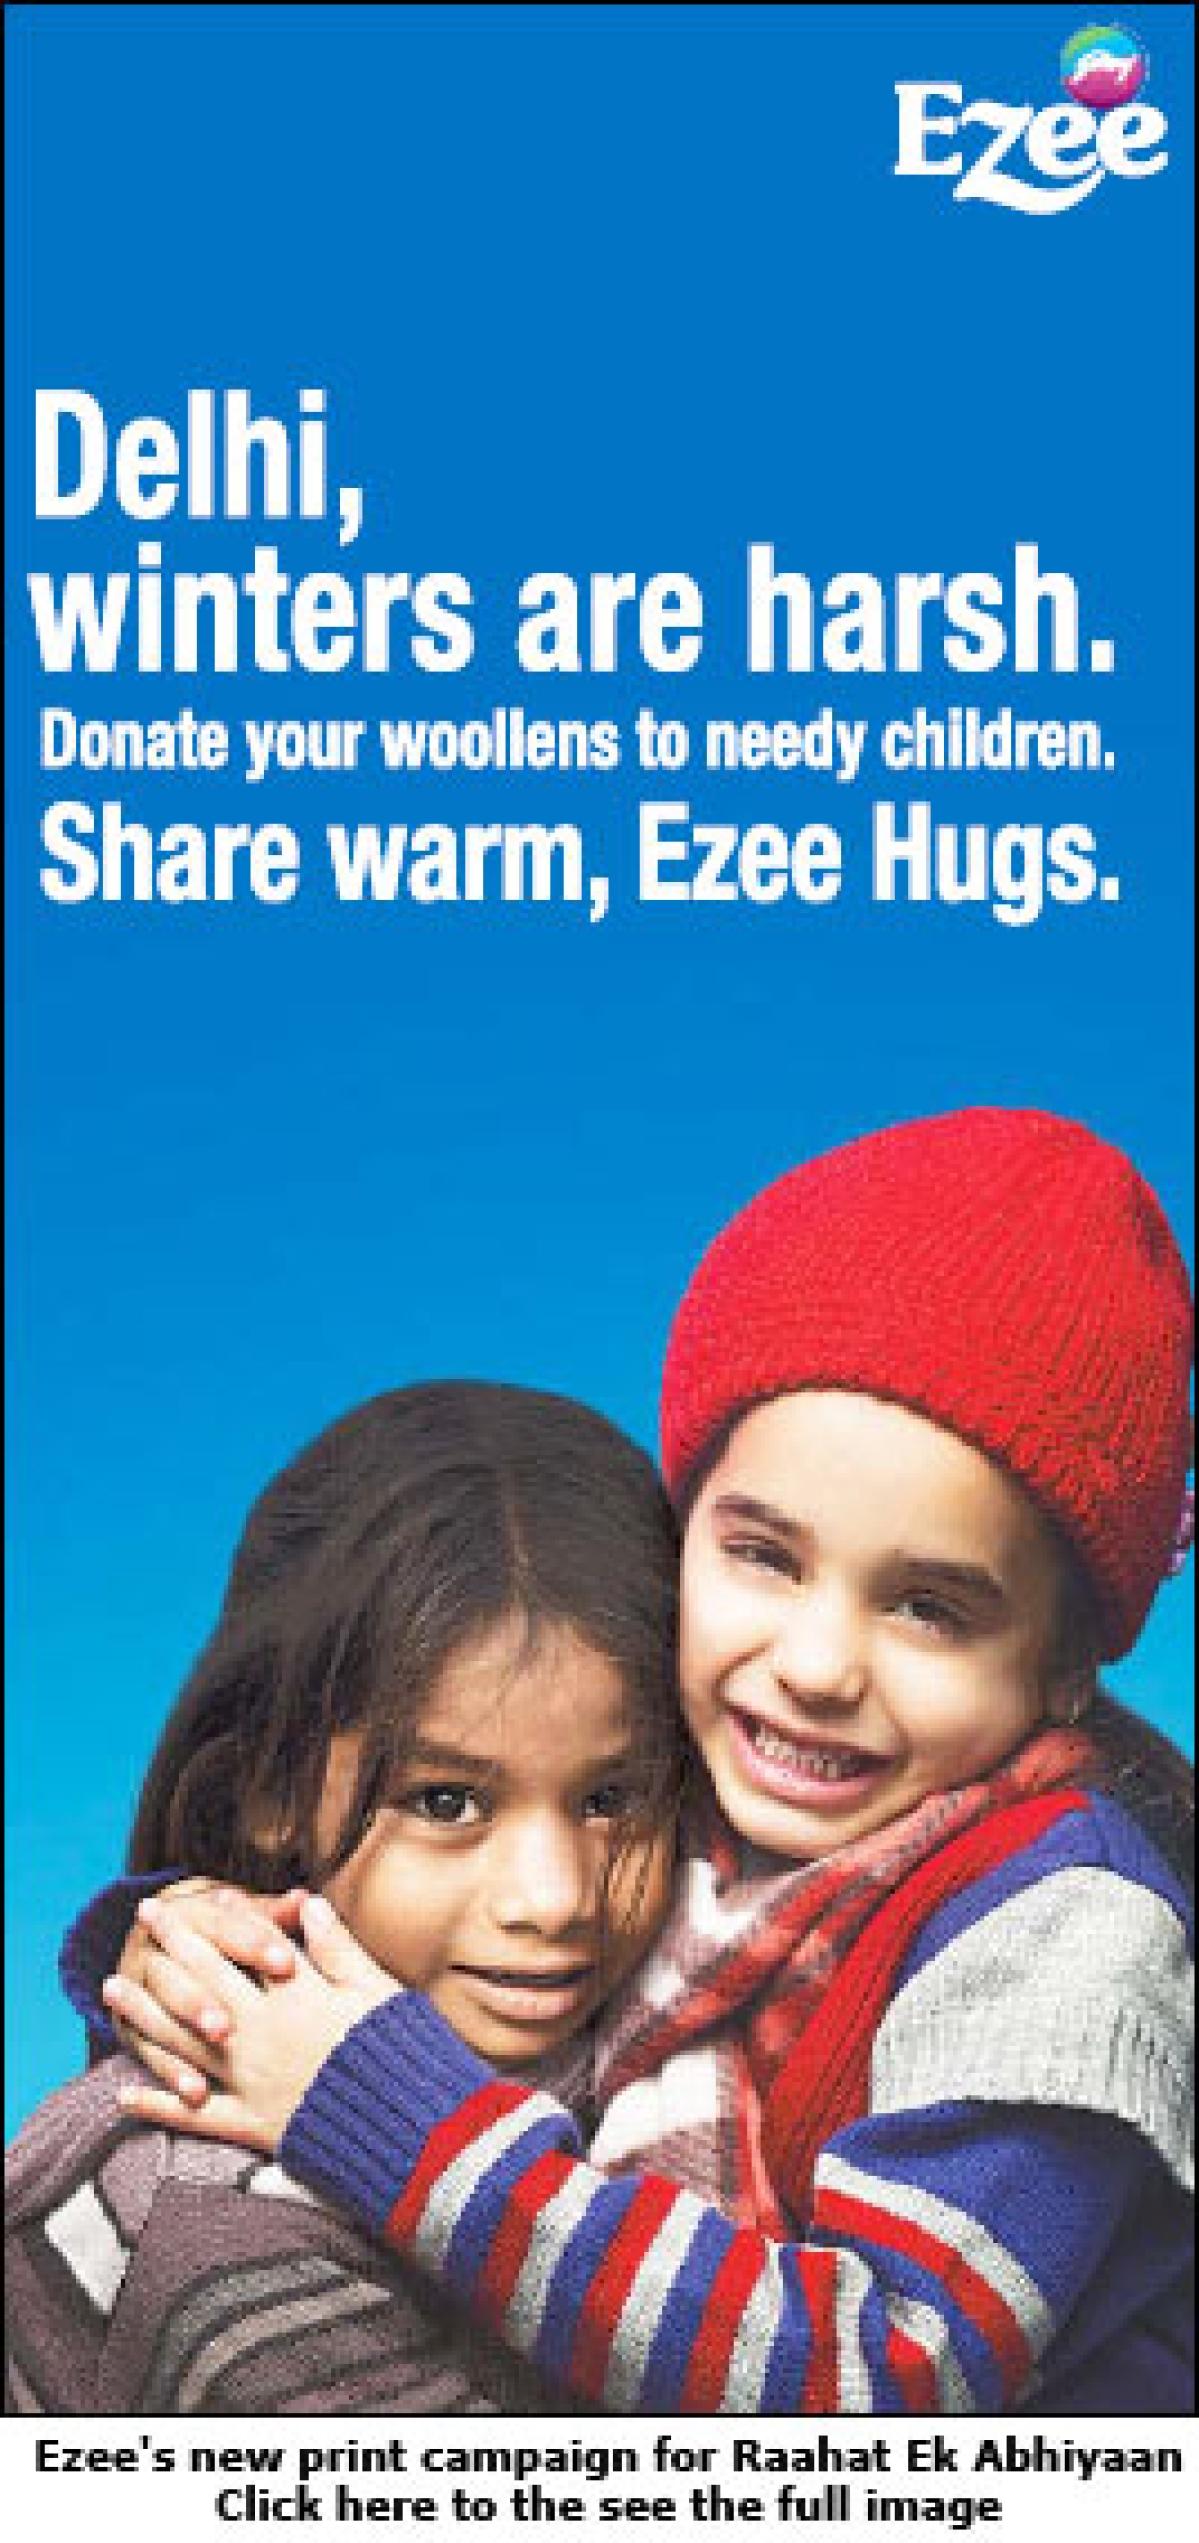 Godrej's Ezee guns for a warm and fuzzy winter